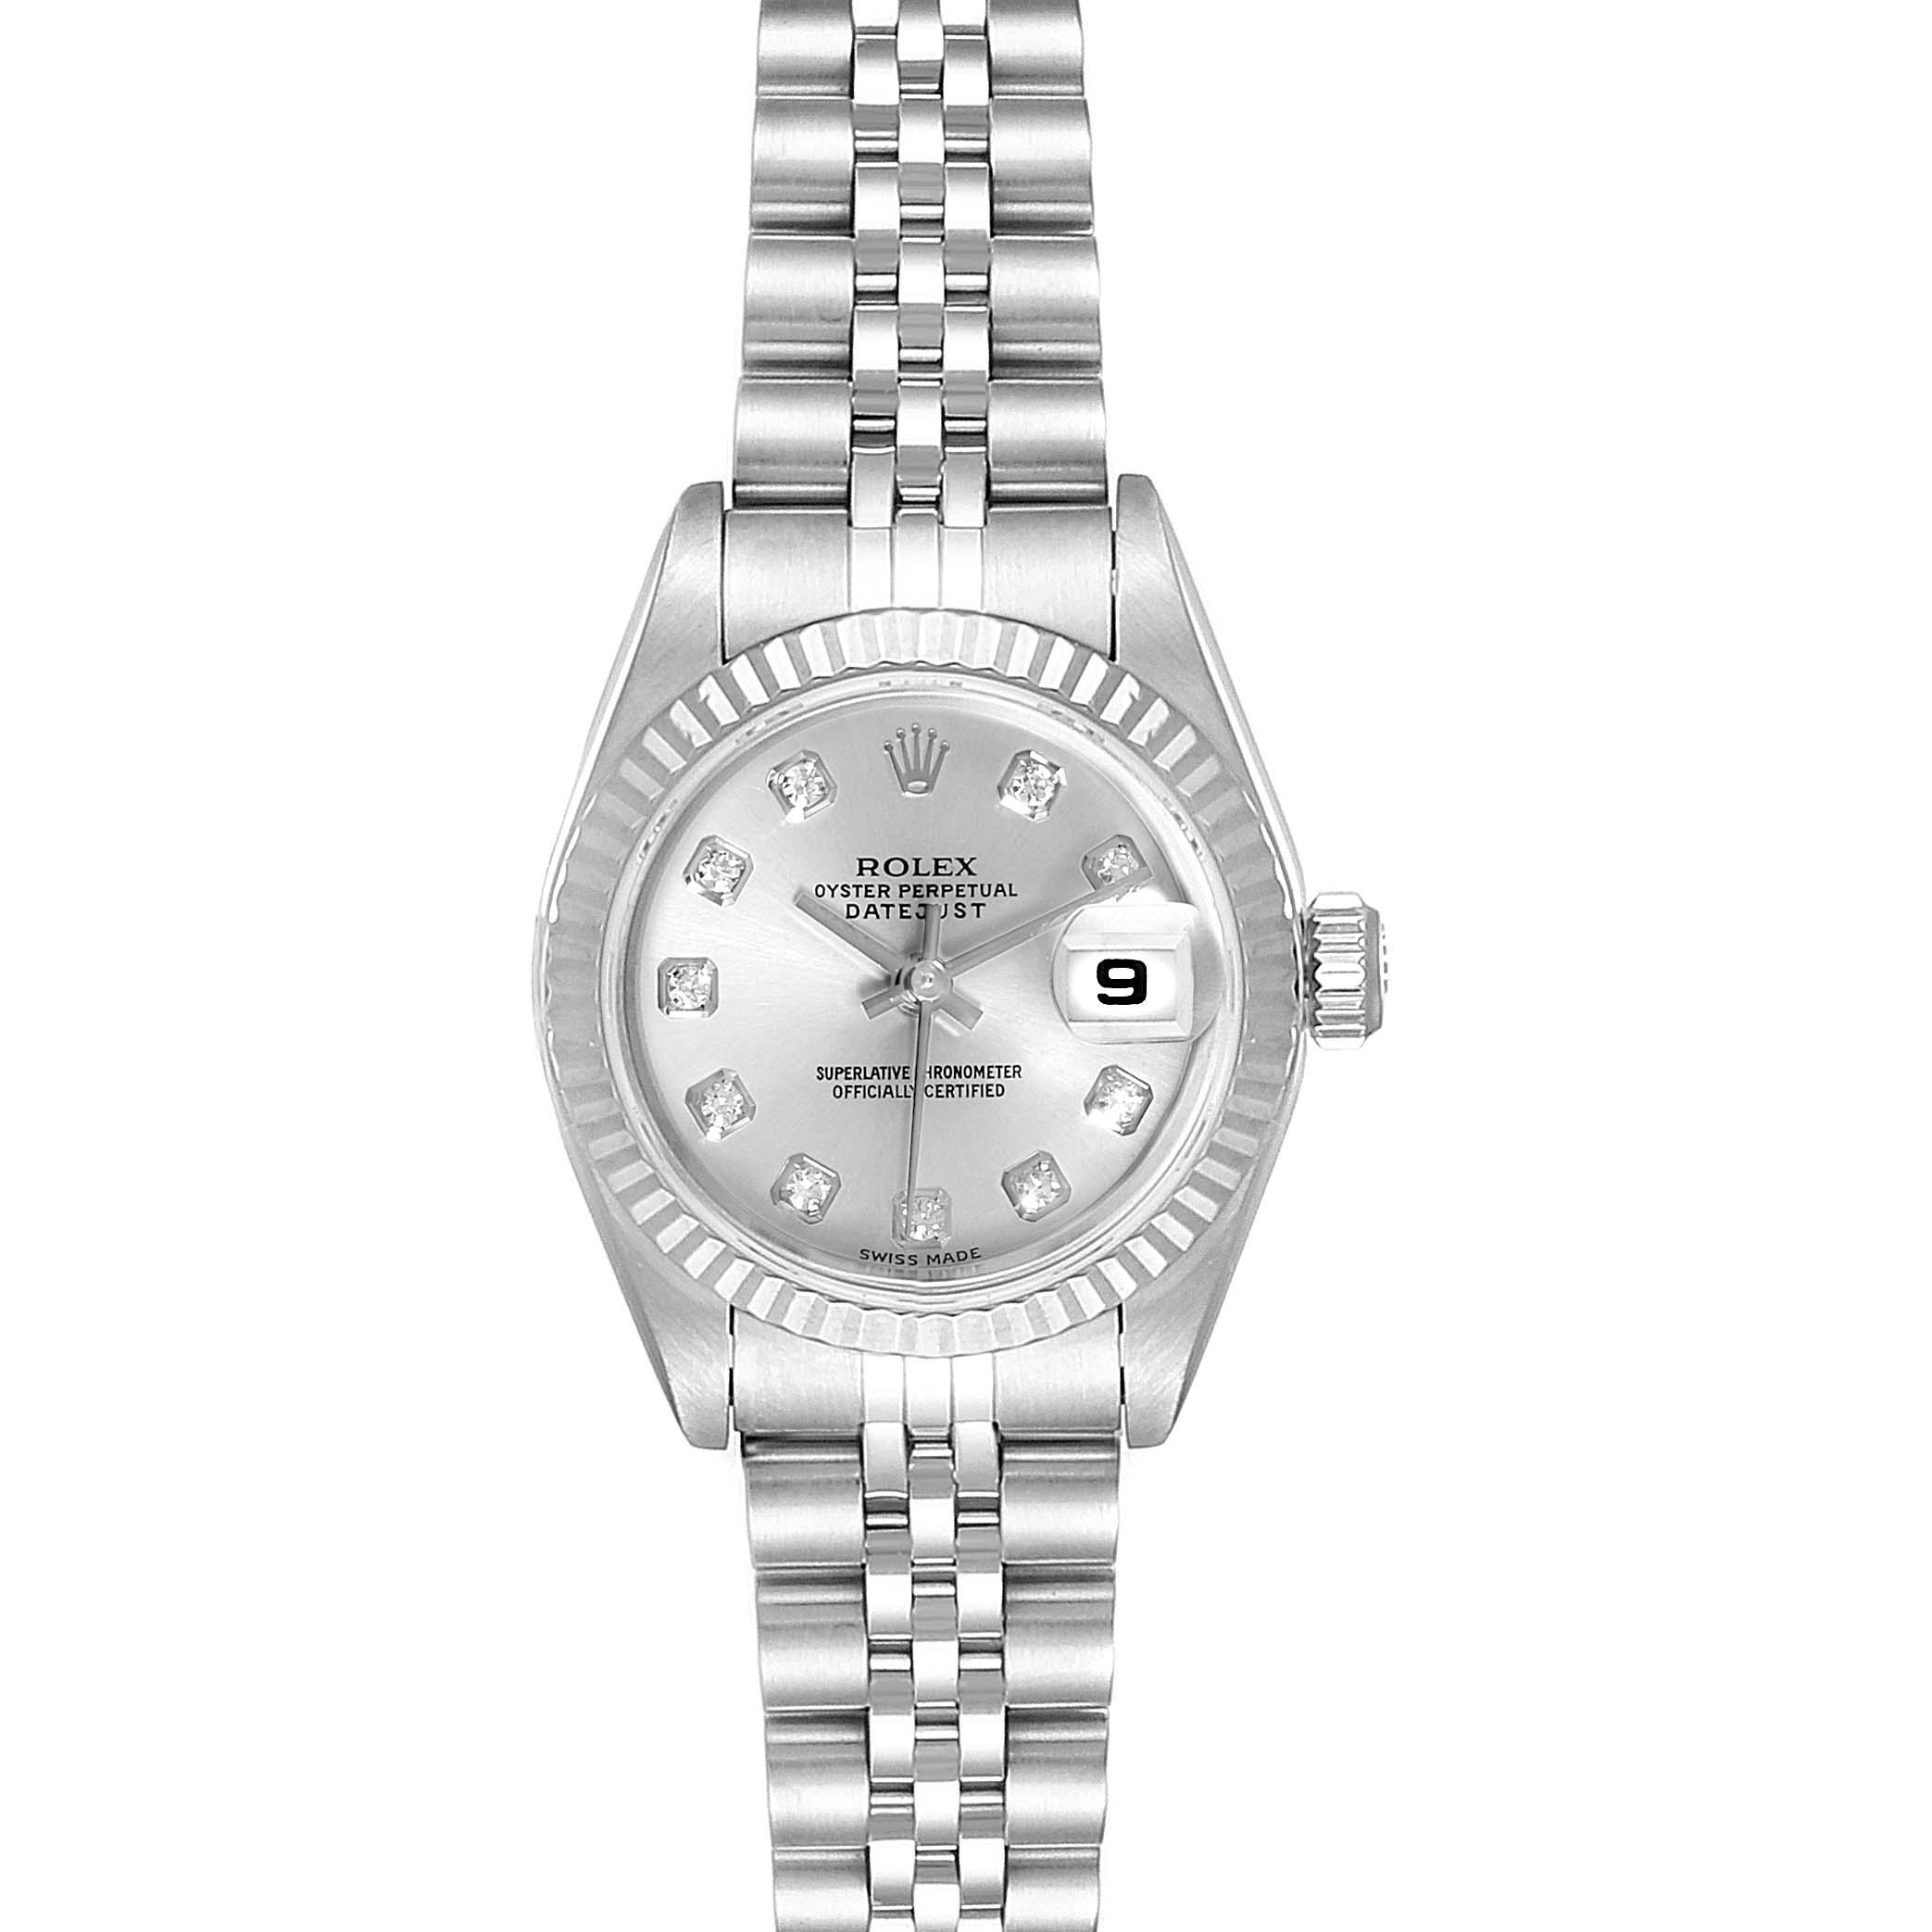 Rolex Datejust 26 Steel White Gold Silver Diamond Dial Ladies Watch 79174